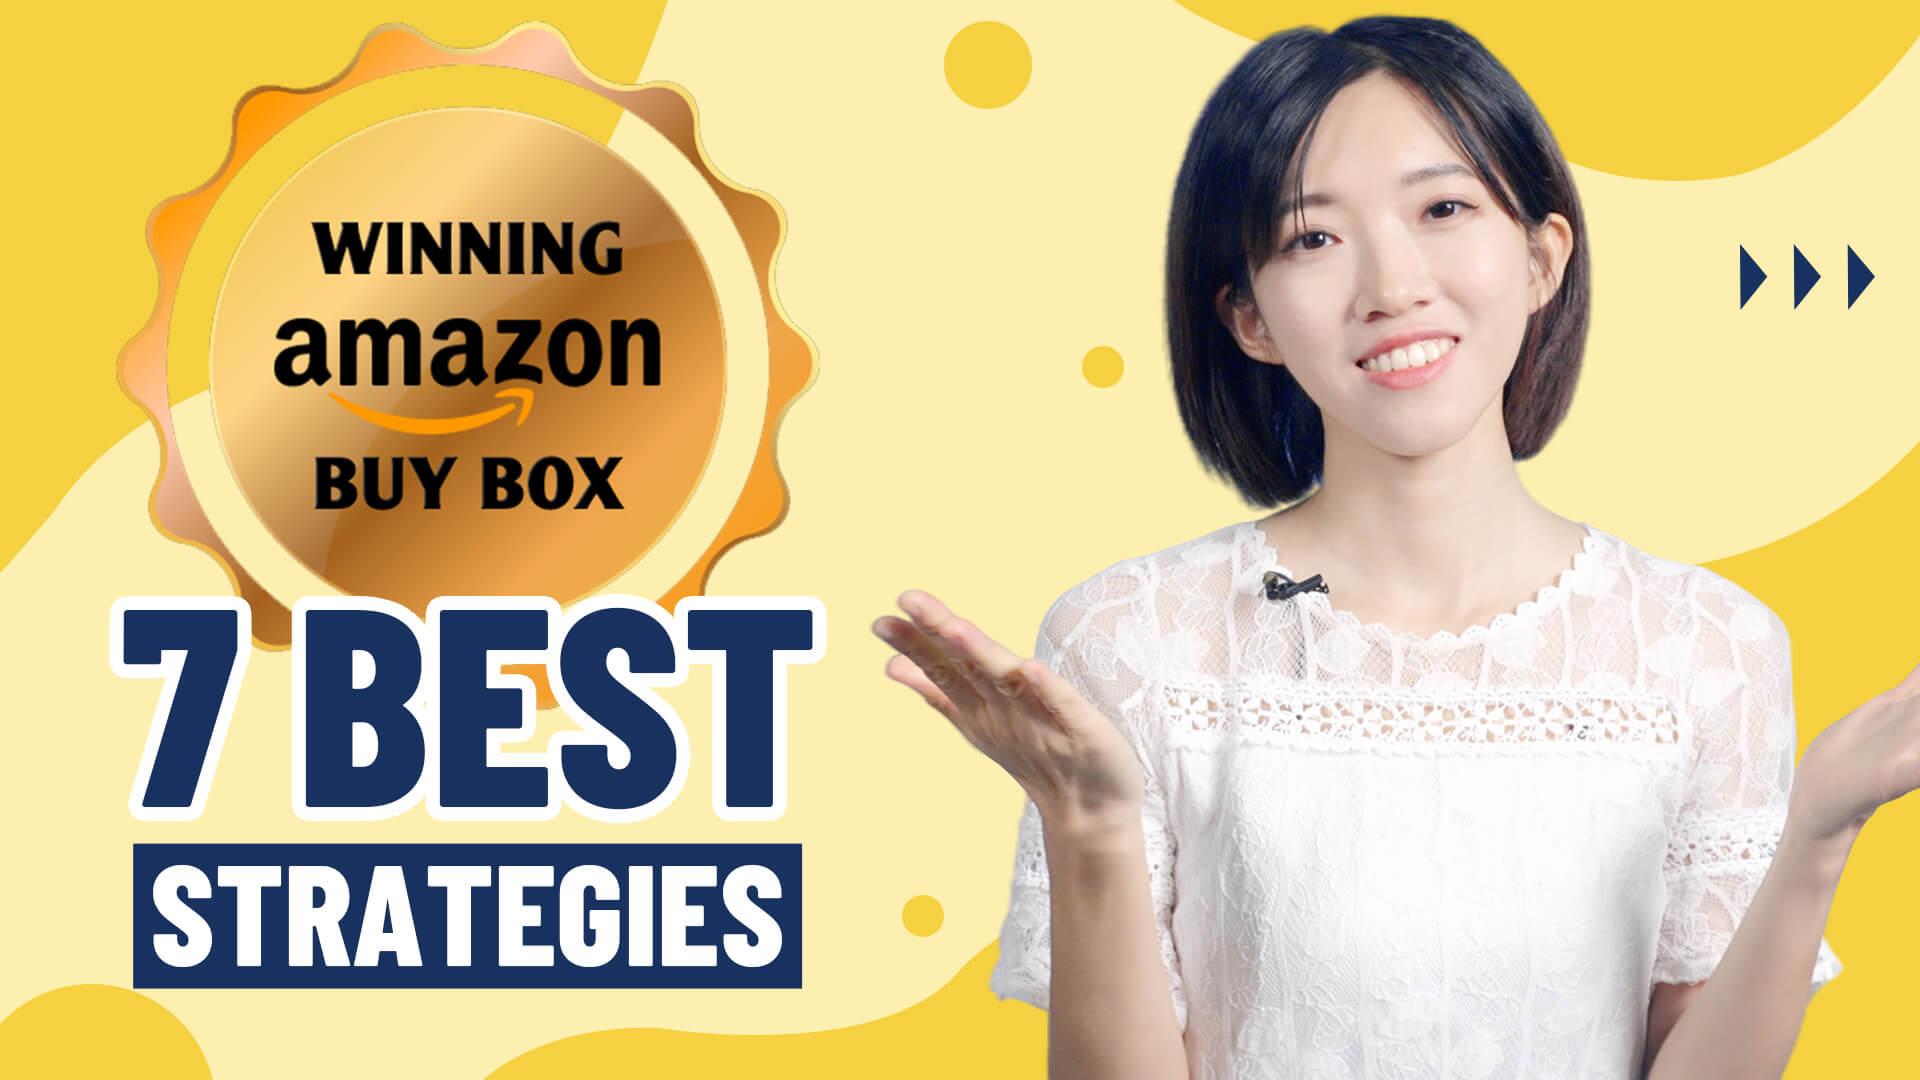 7 Best Strategies to Win Amazon Buy Box